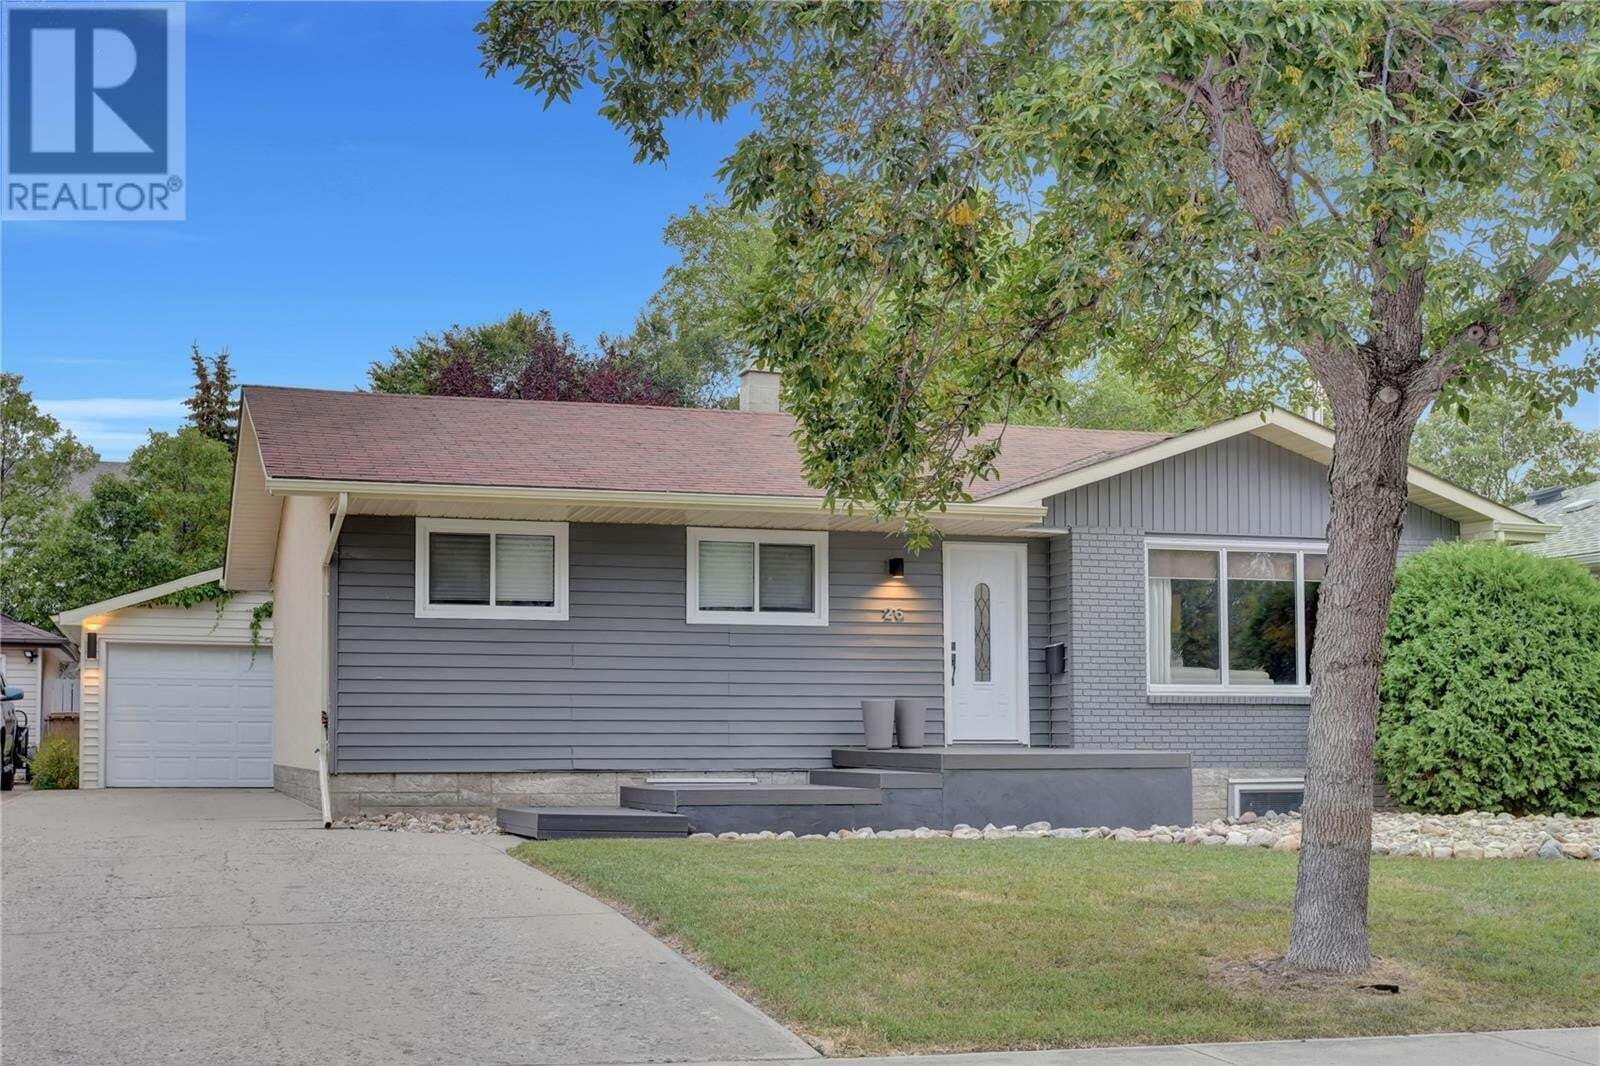 House for sale at 26 Windfield Rd Regina Saskatchewan - MLS: SK826870